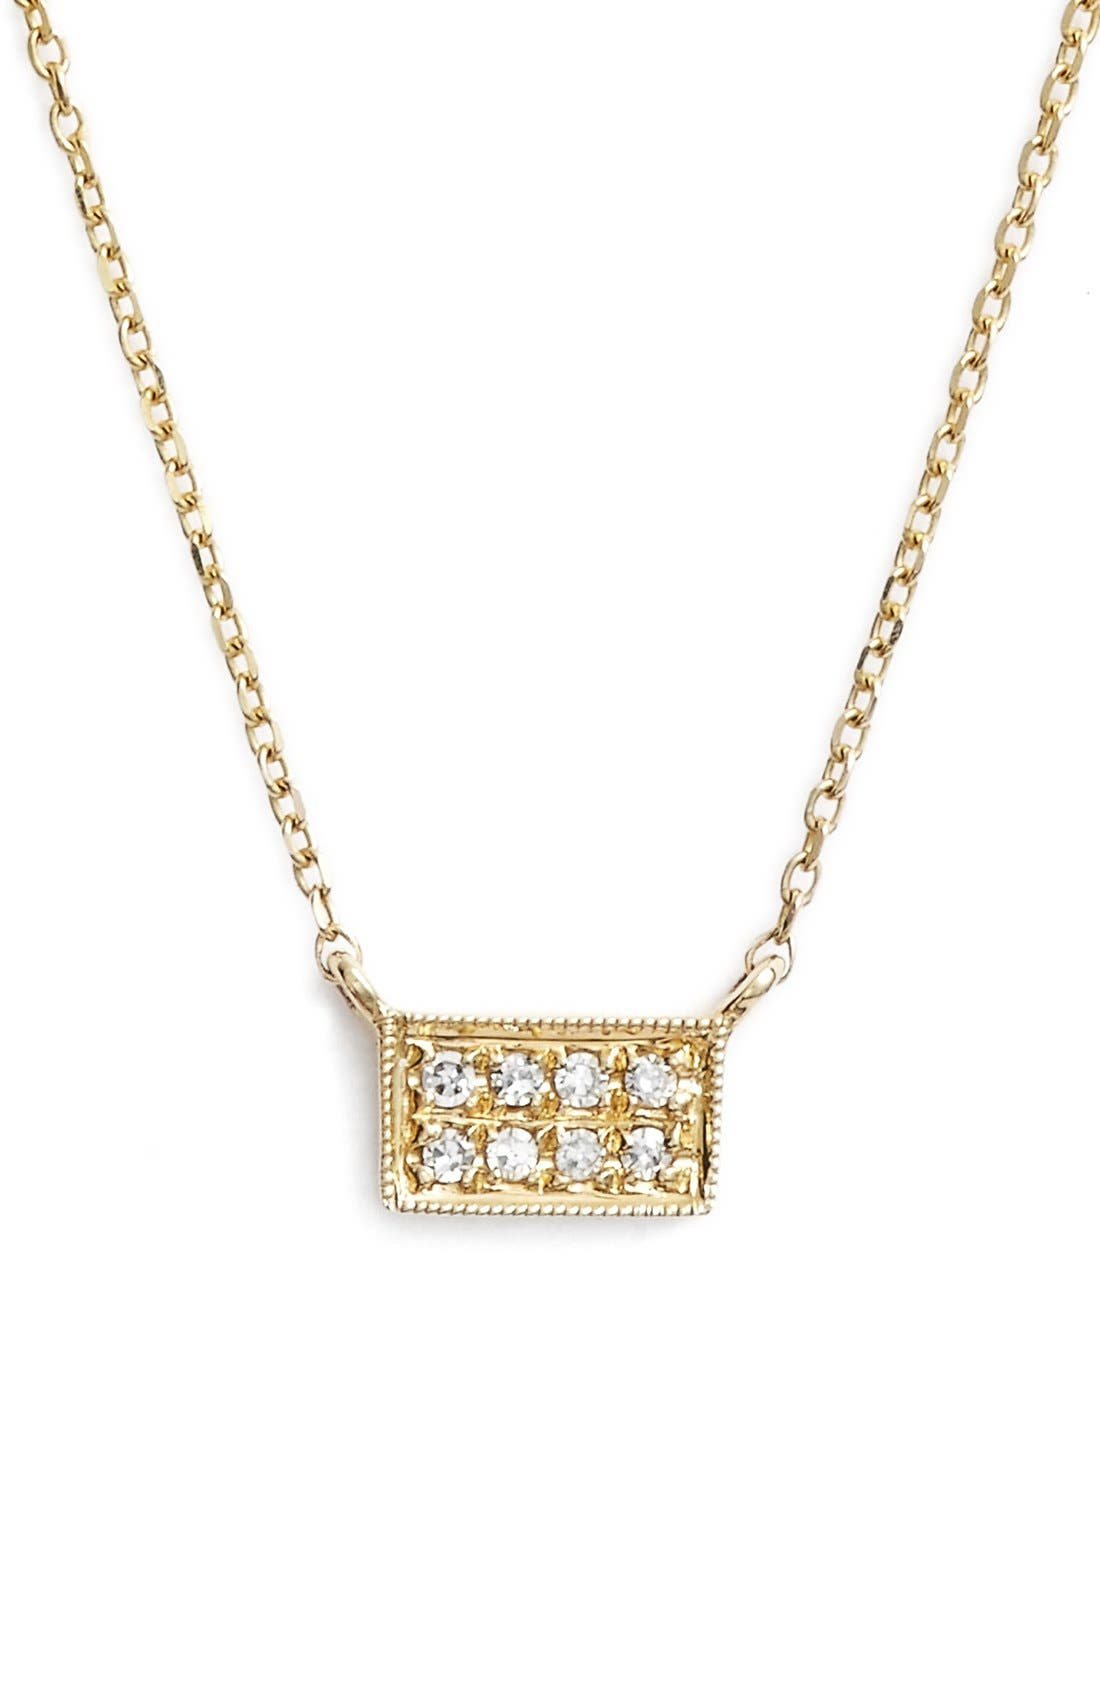 DANA REBECCA DESIGNS Katie Diamond Bar Pendant Necklace